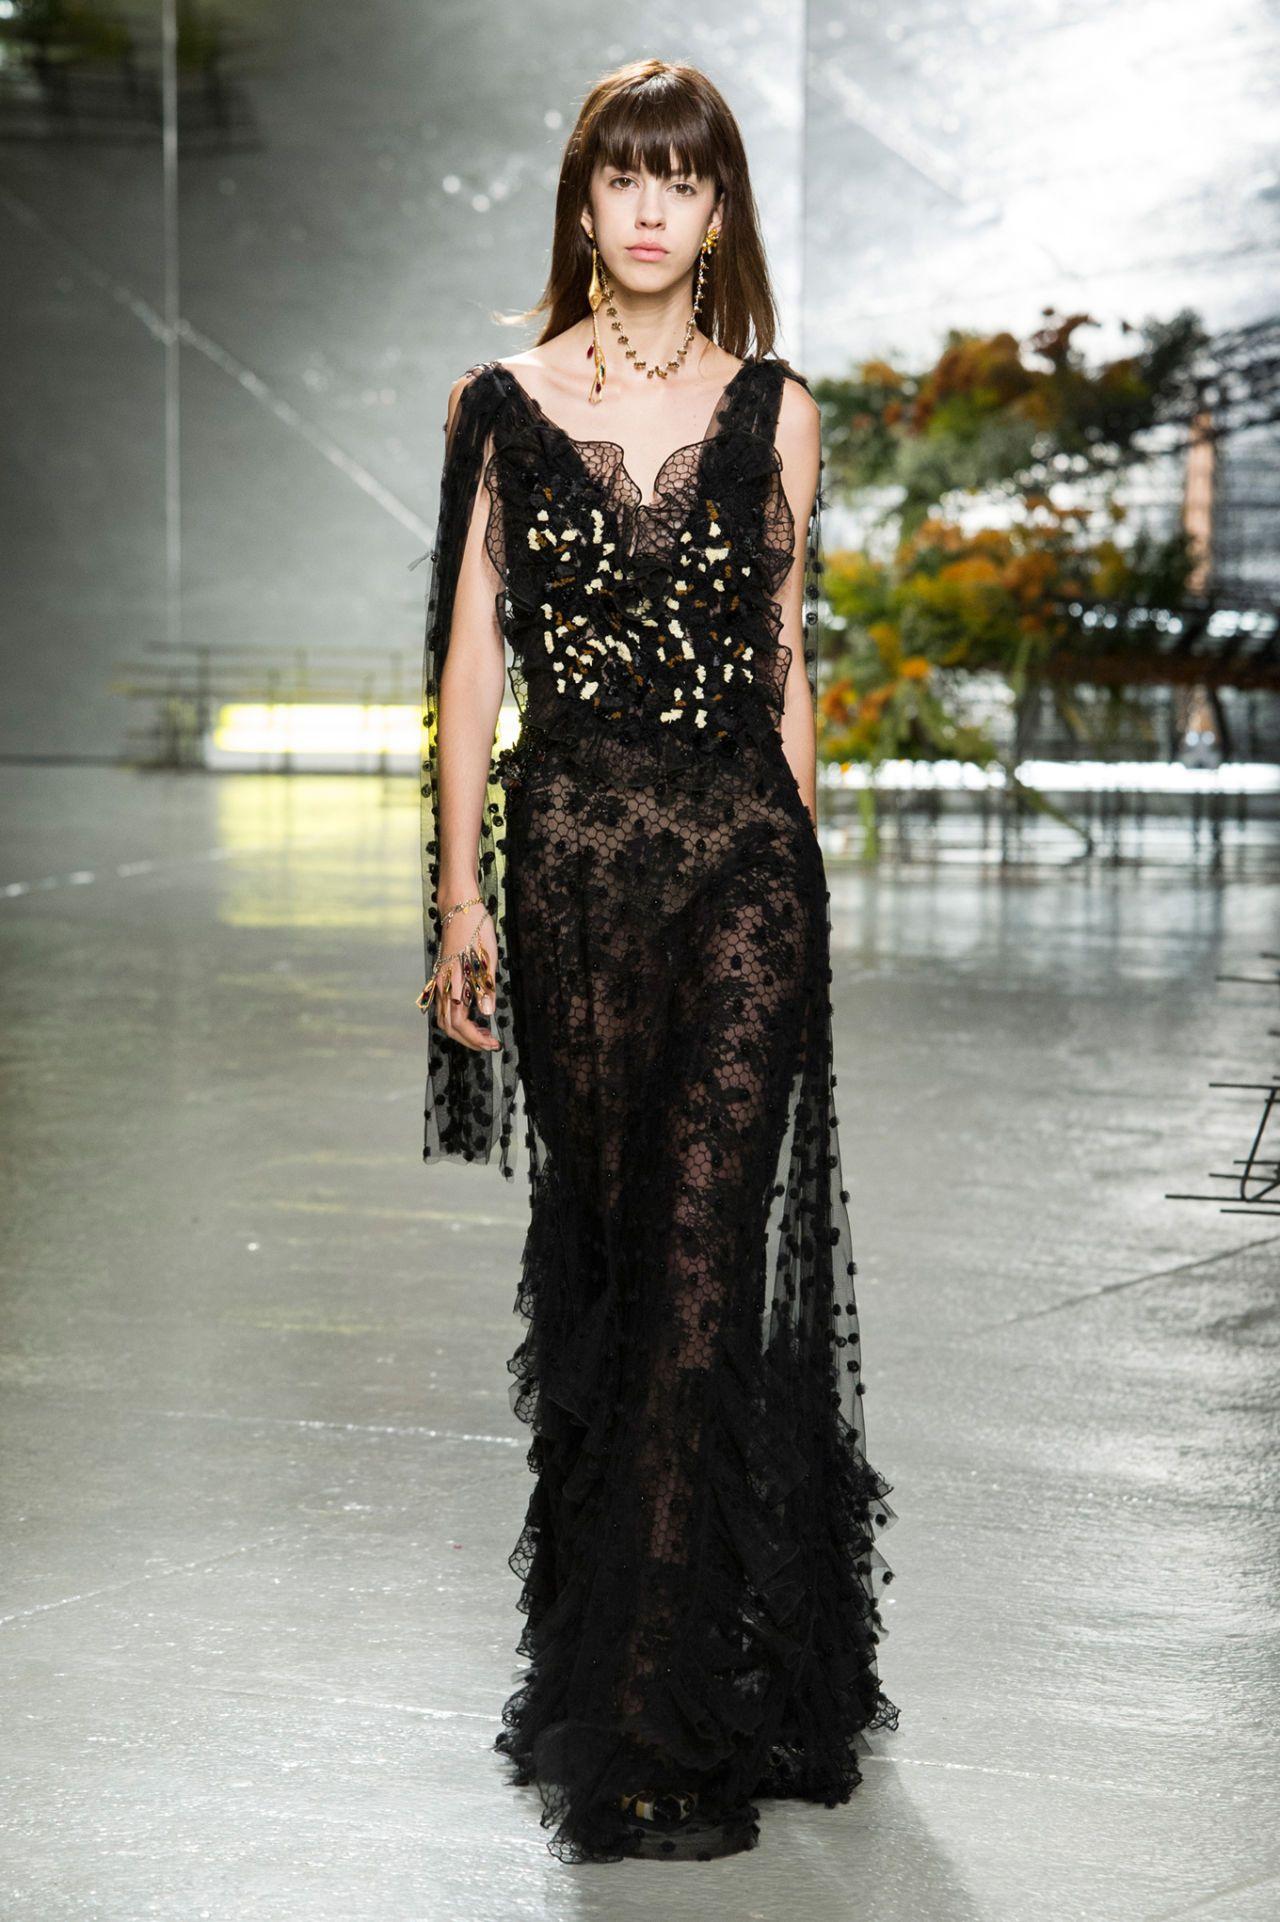 Vestiti lunghi eleganti neri   Stile e bellezza   Total